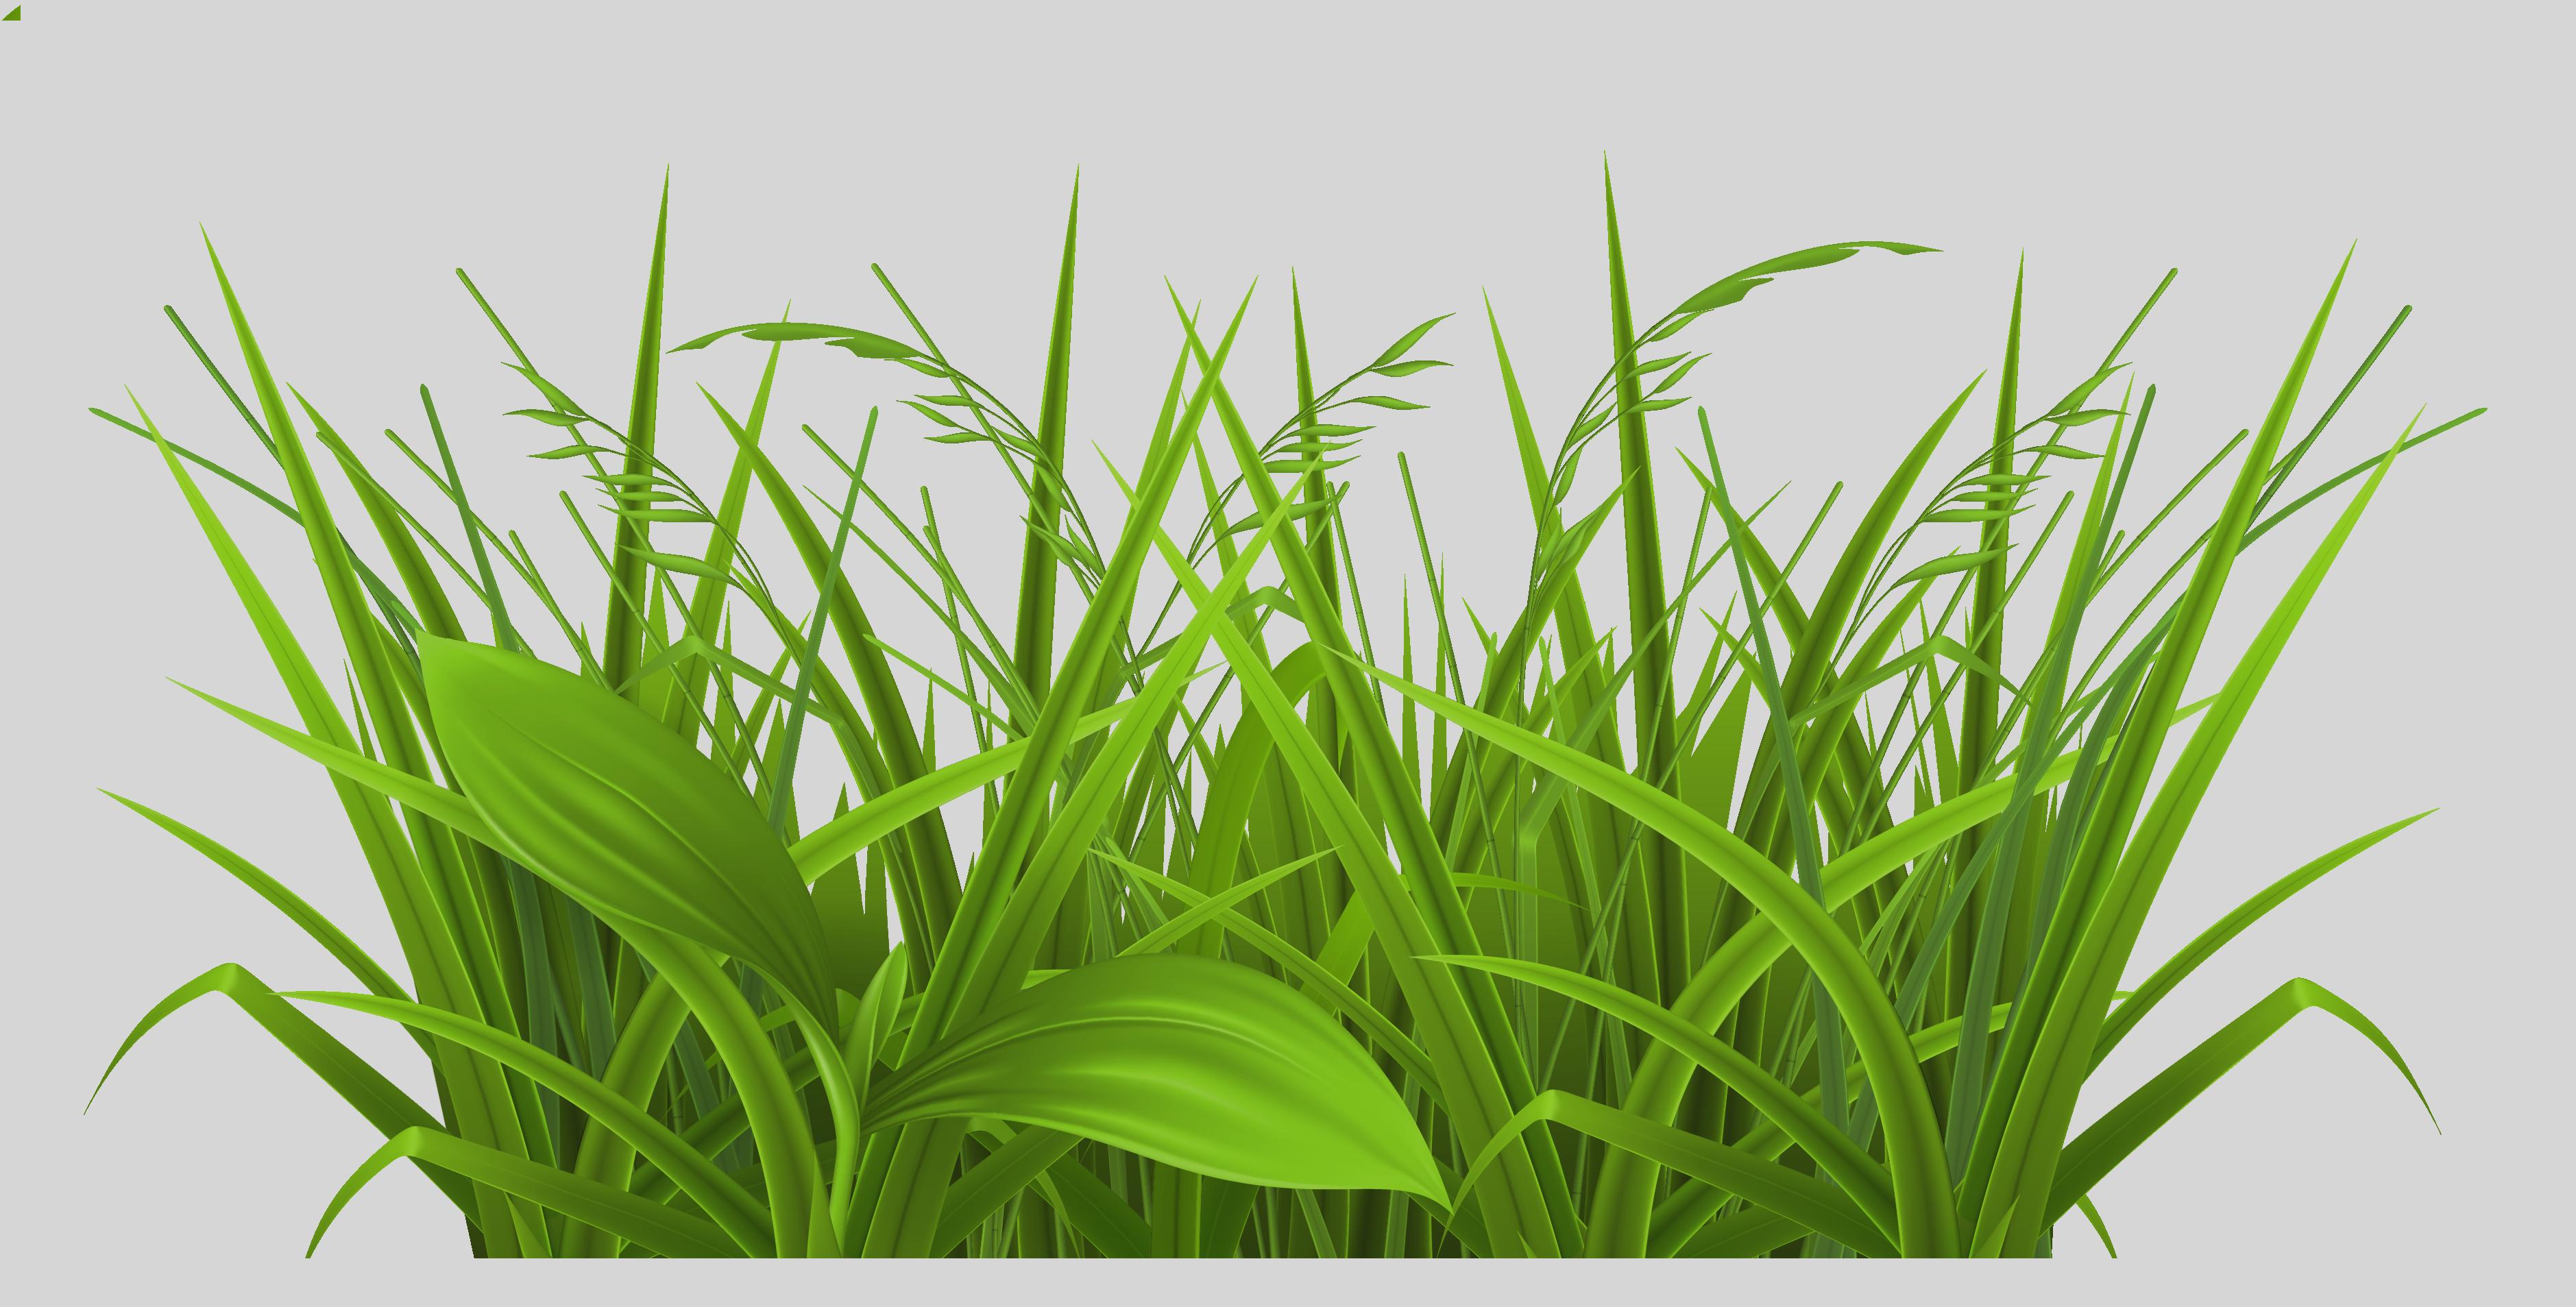 3758x1907 Clip Art Grass Clipart Free Clip Art Images 0wfxnuq